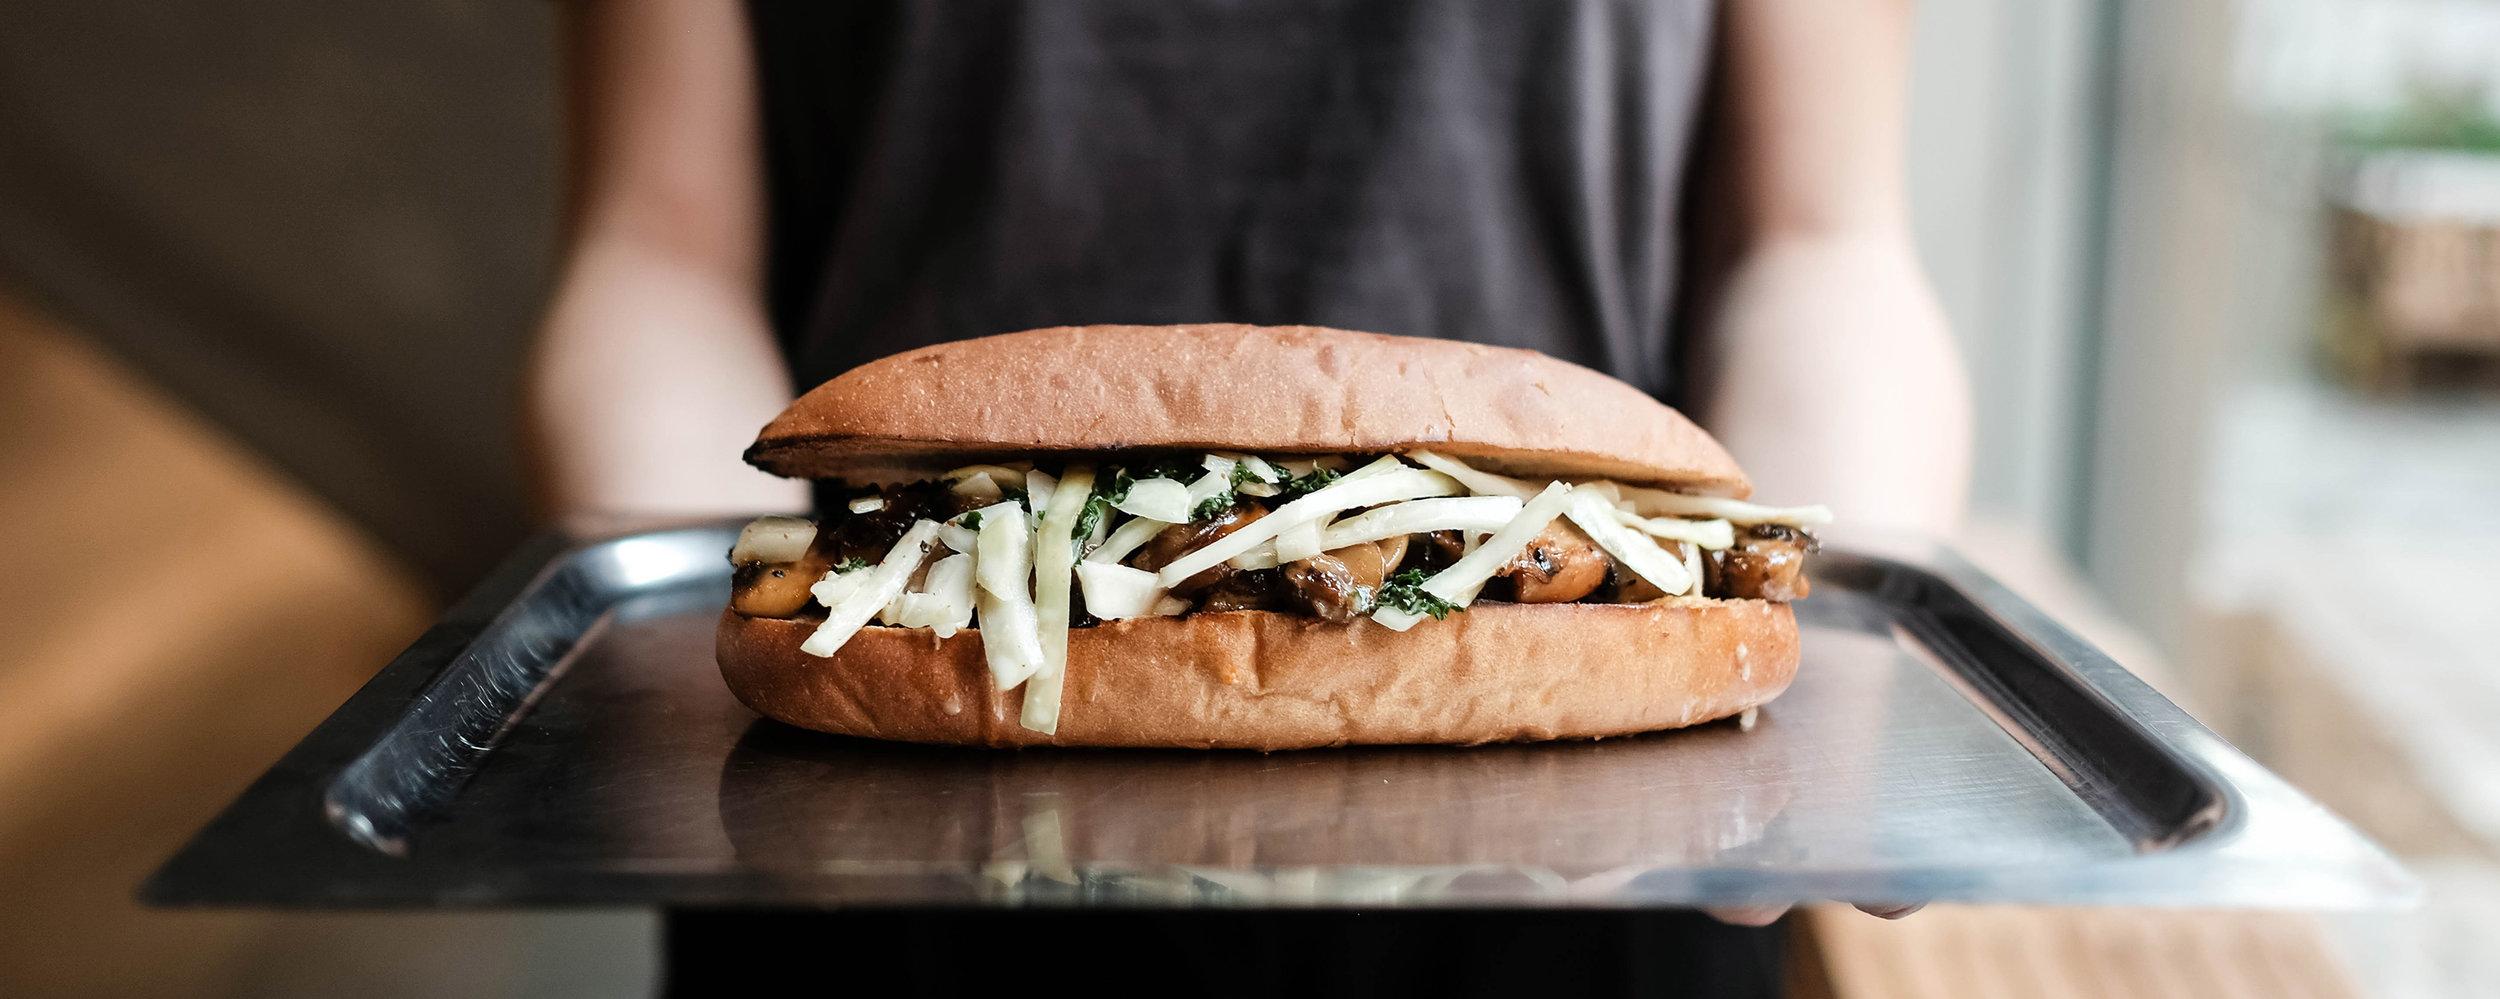 poms_sandwich_malmo.jpg